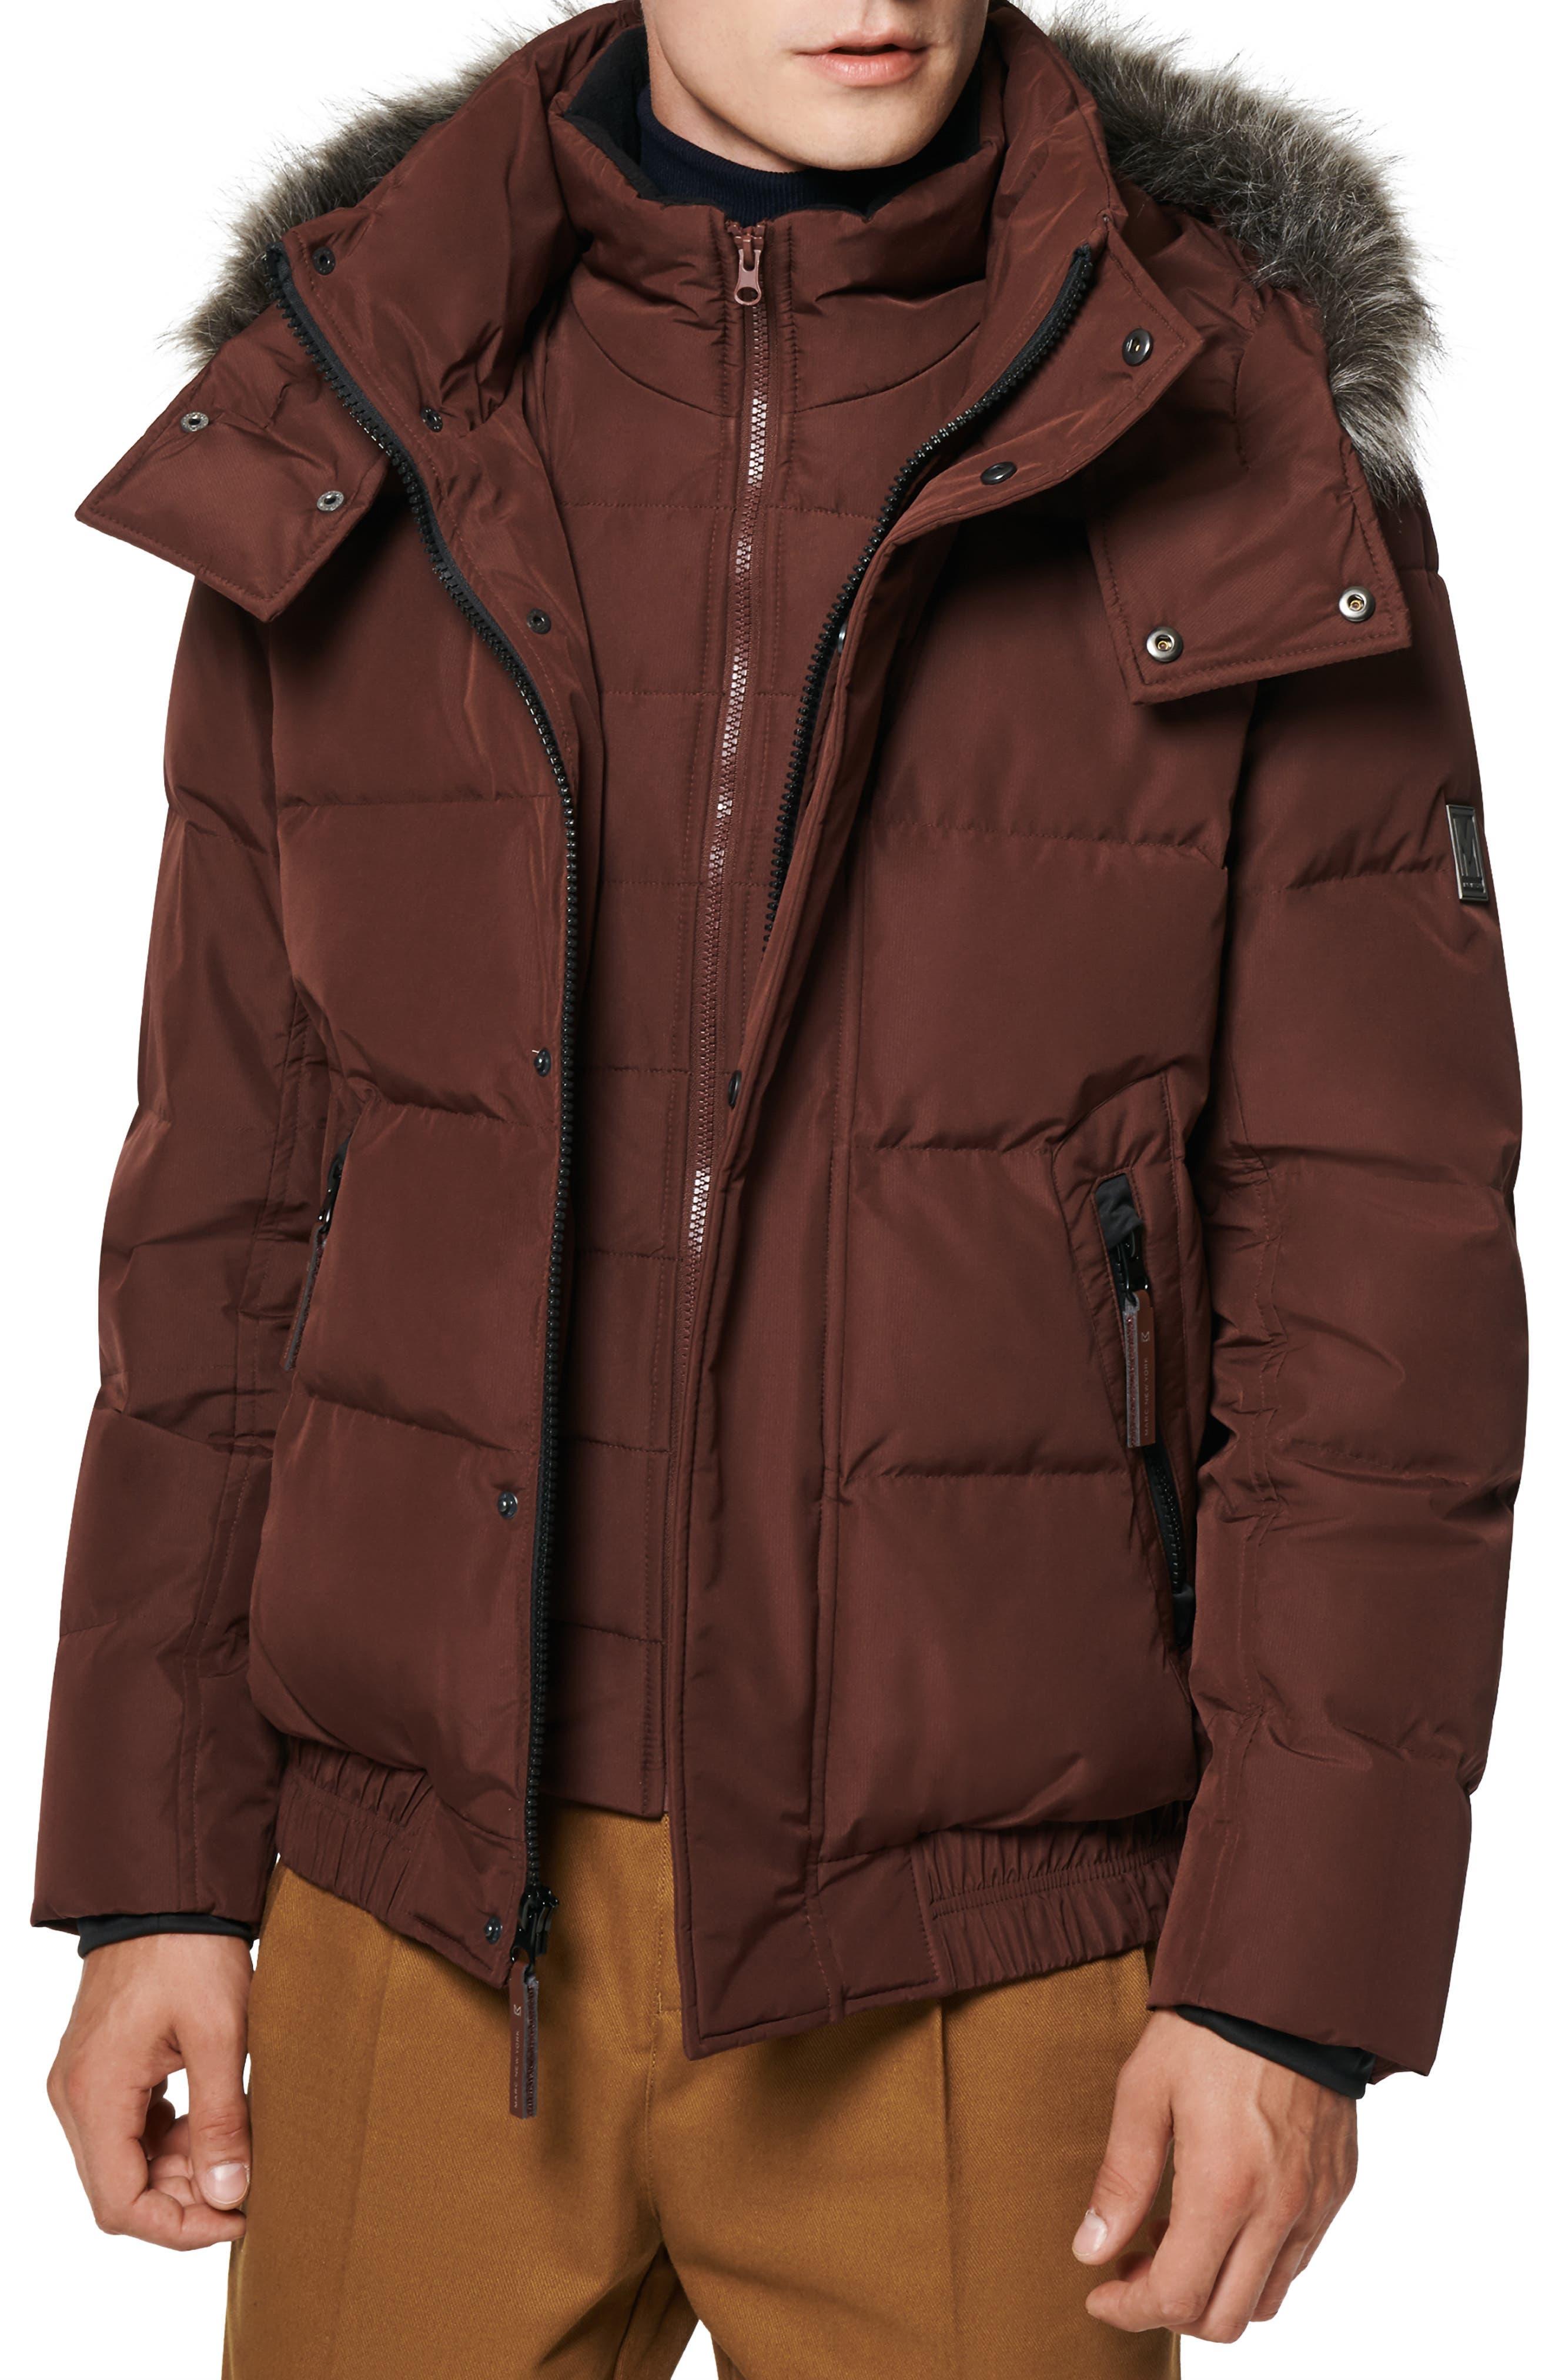 Umbra Faux Fur Trim Quilted Jacket